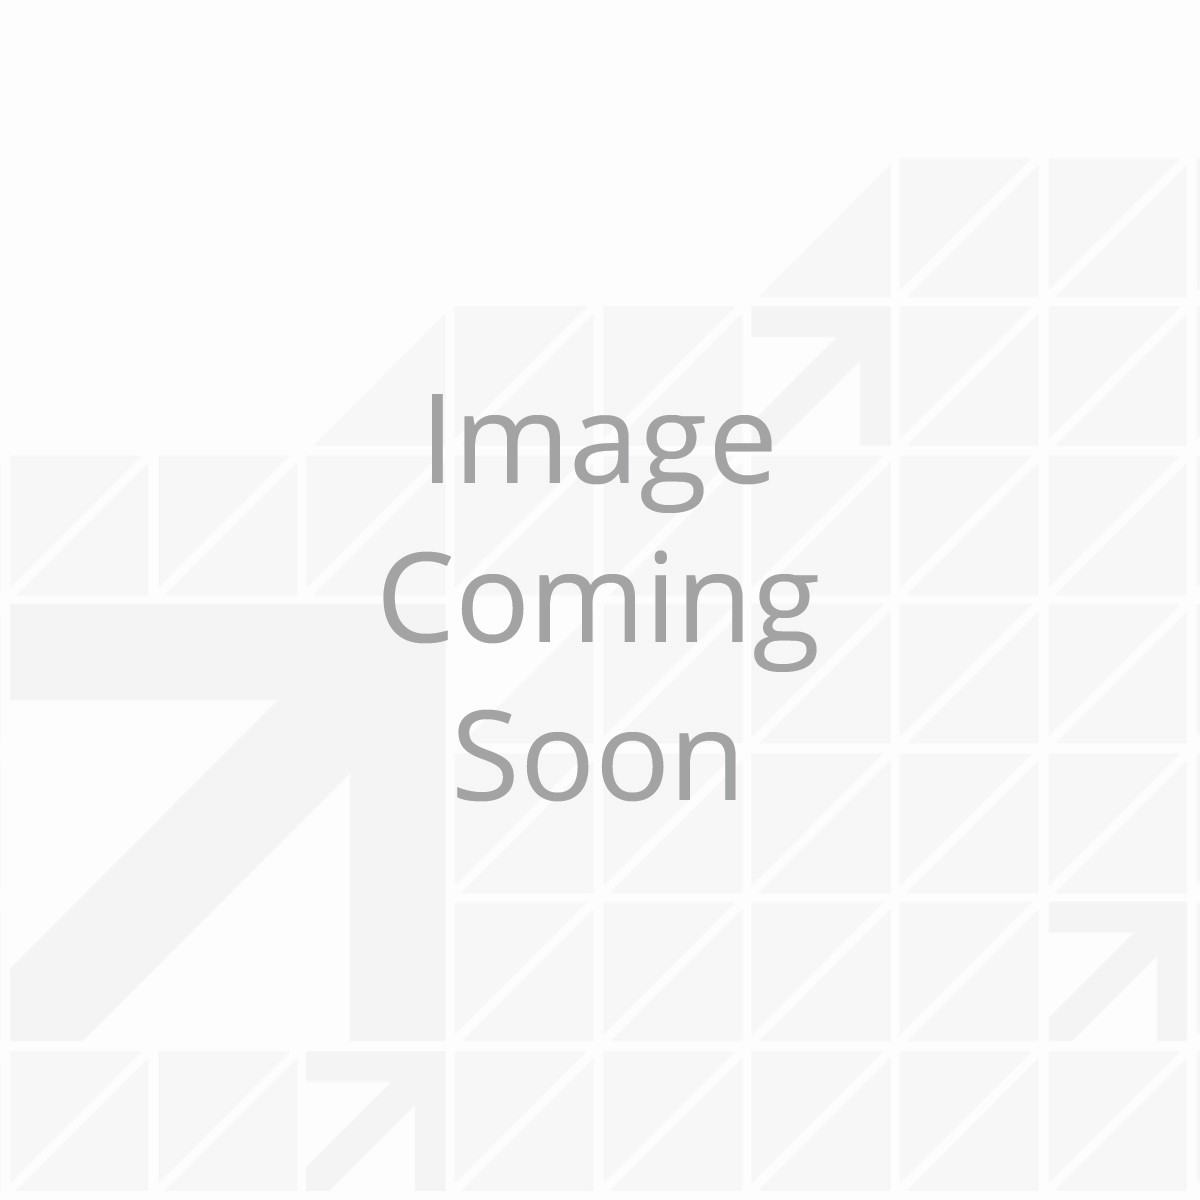 Auto Leveling Control Mini-Touch Pad